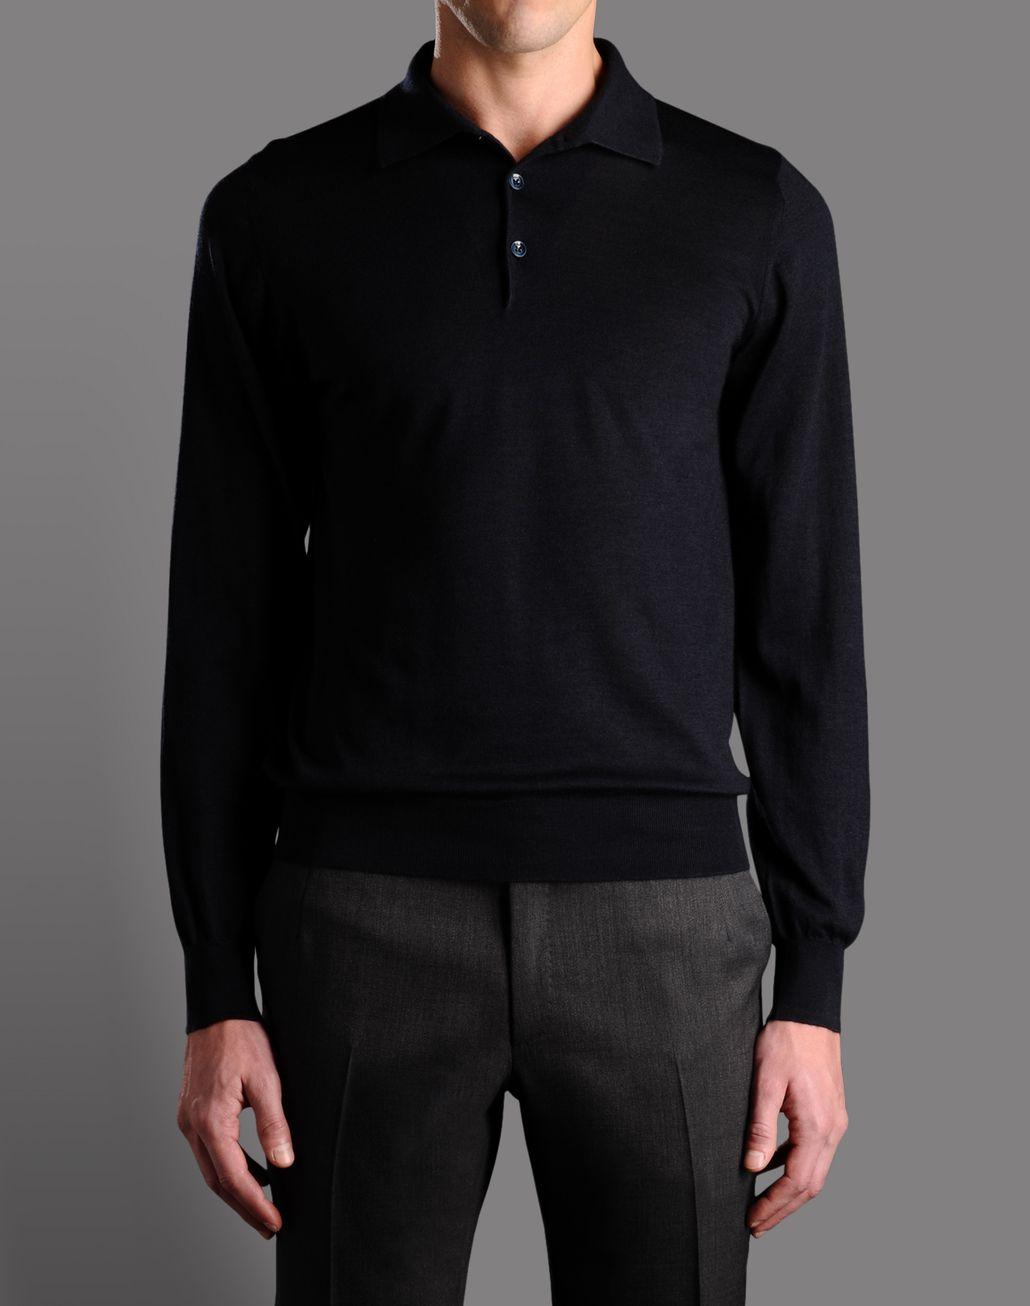 BRIONI POLO SHIRT Knitwear U f